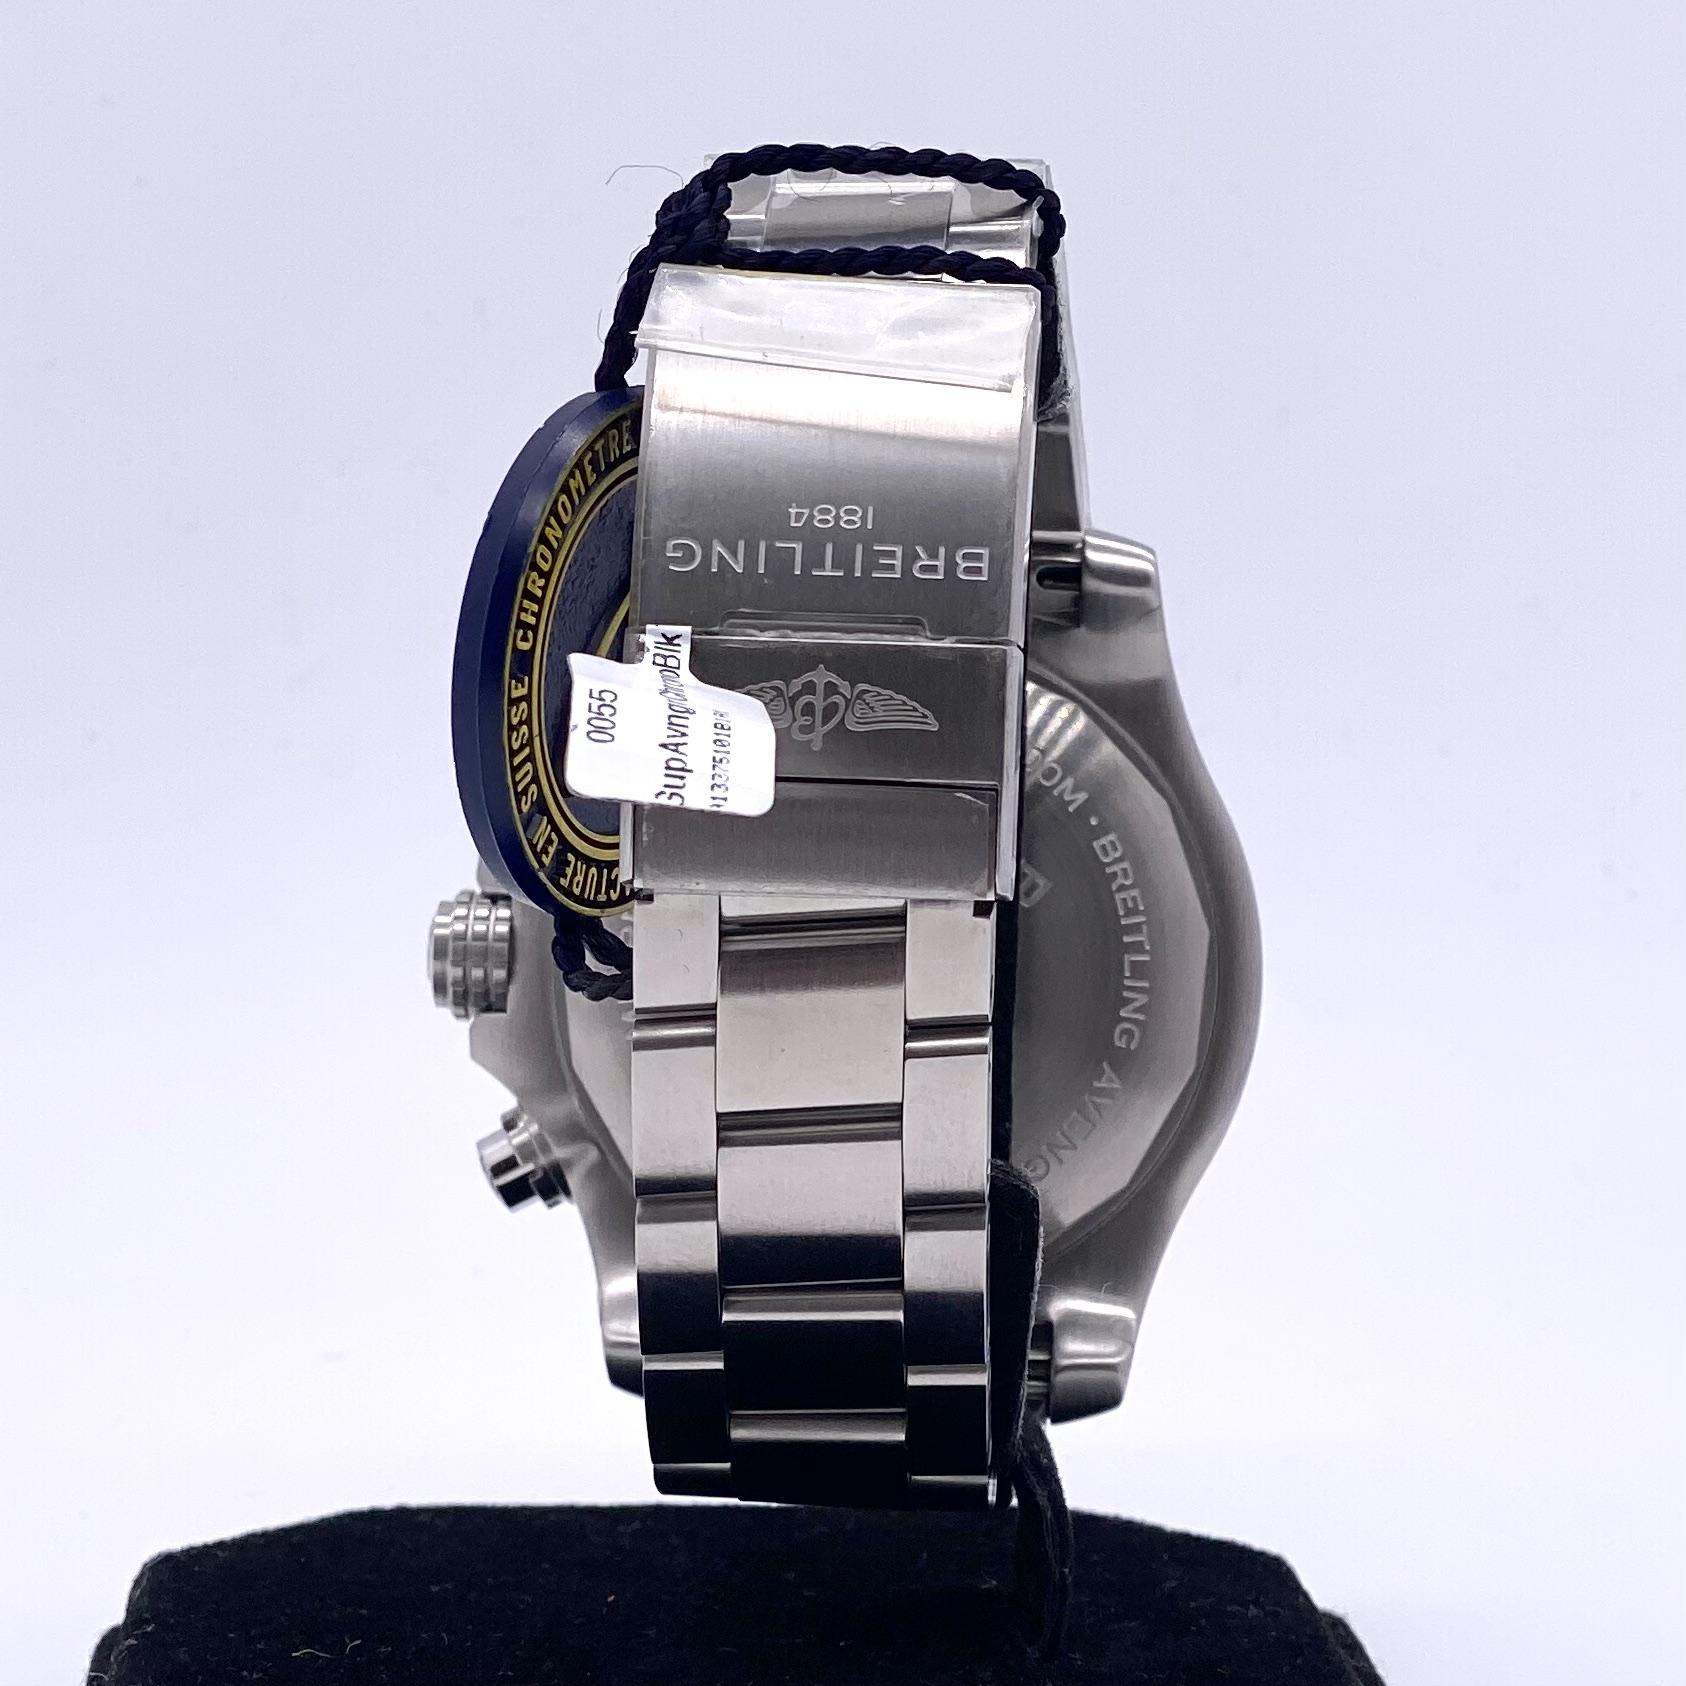 Breitling Avenger A1337S - Image 3 of 3